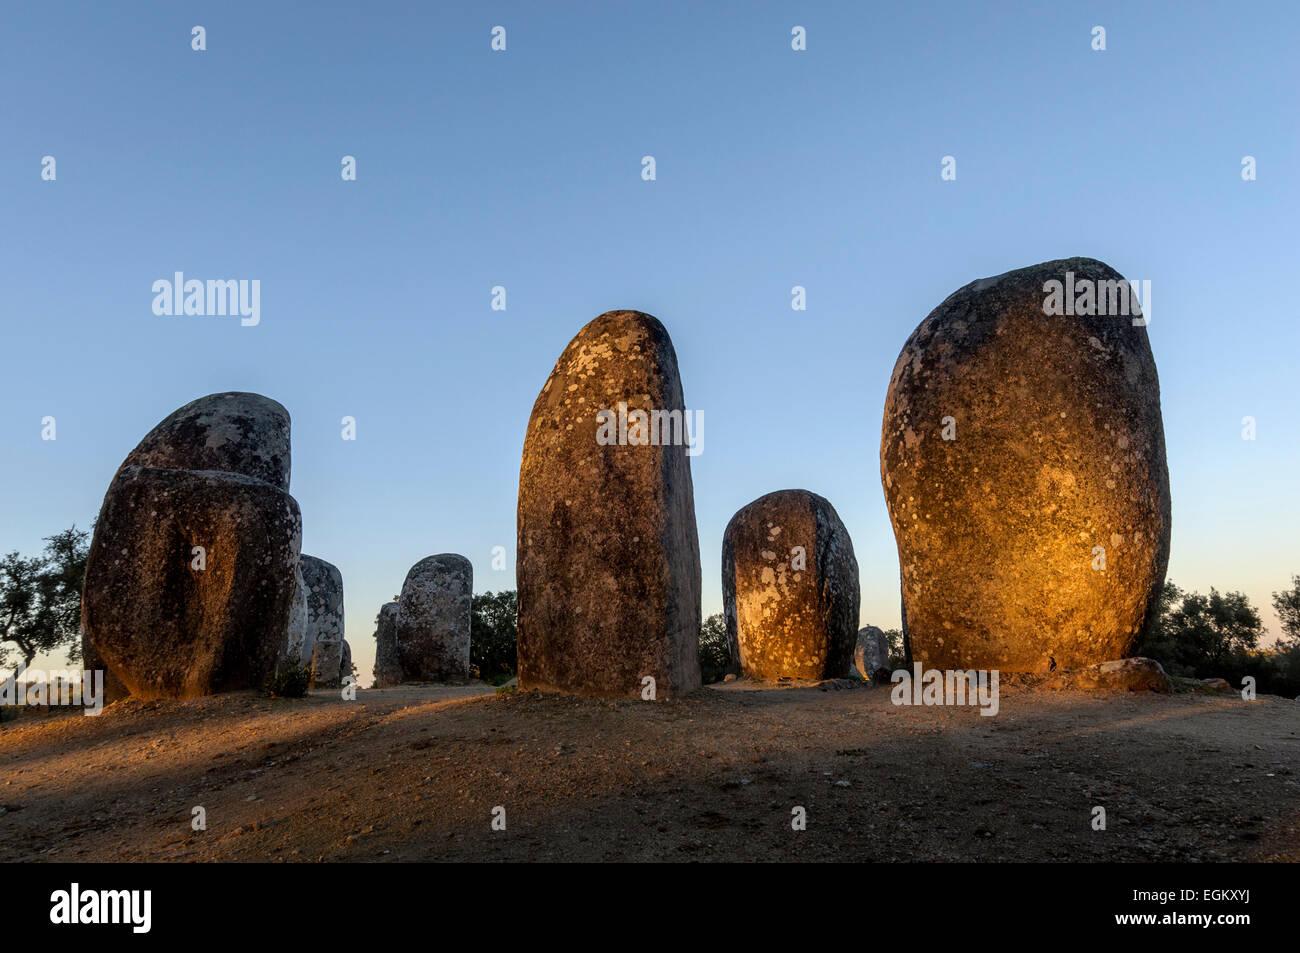 Cromeleque dos Almendres, Almendres stone circle - Stock Image